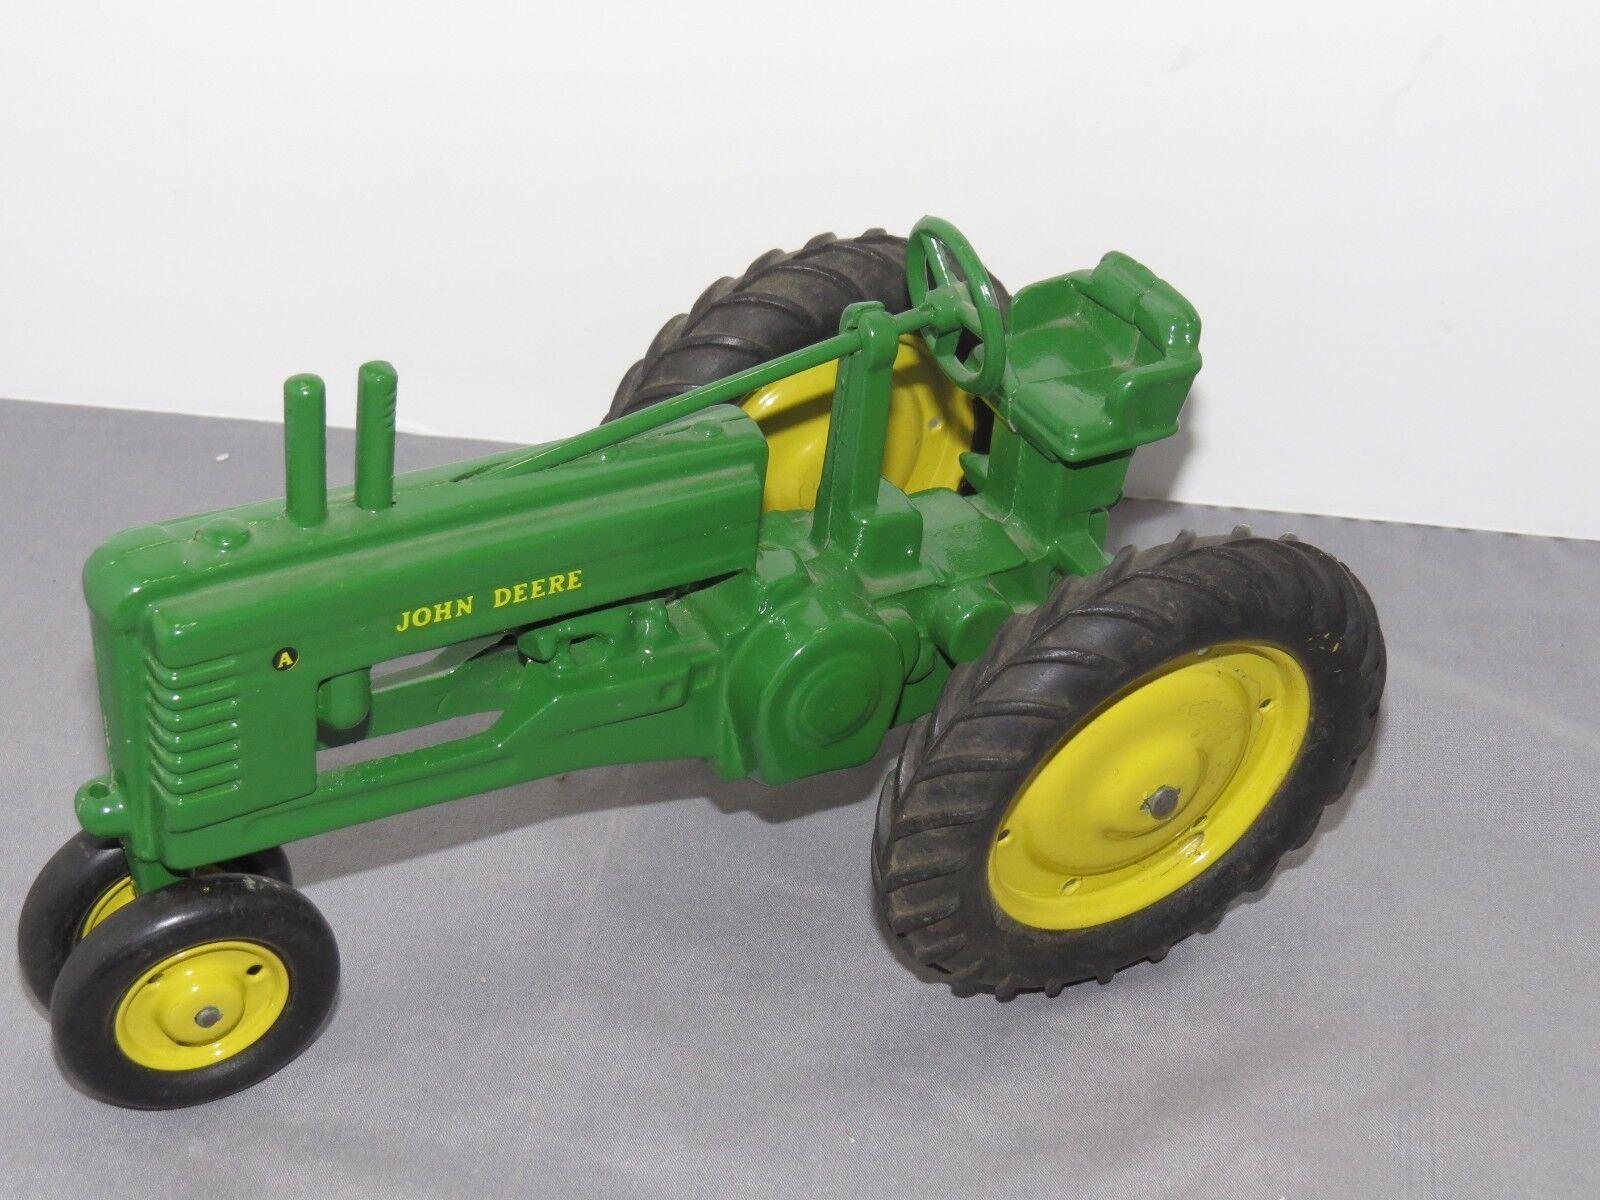 Vintage John Deere Deere Deere High Post Model B A Toy Tractor ERTL Hard to Find 1 16 SHARP  e2d01b